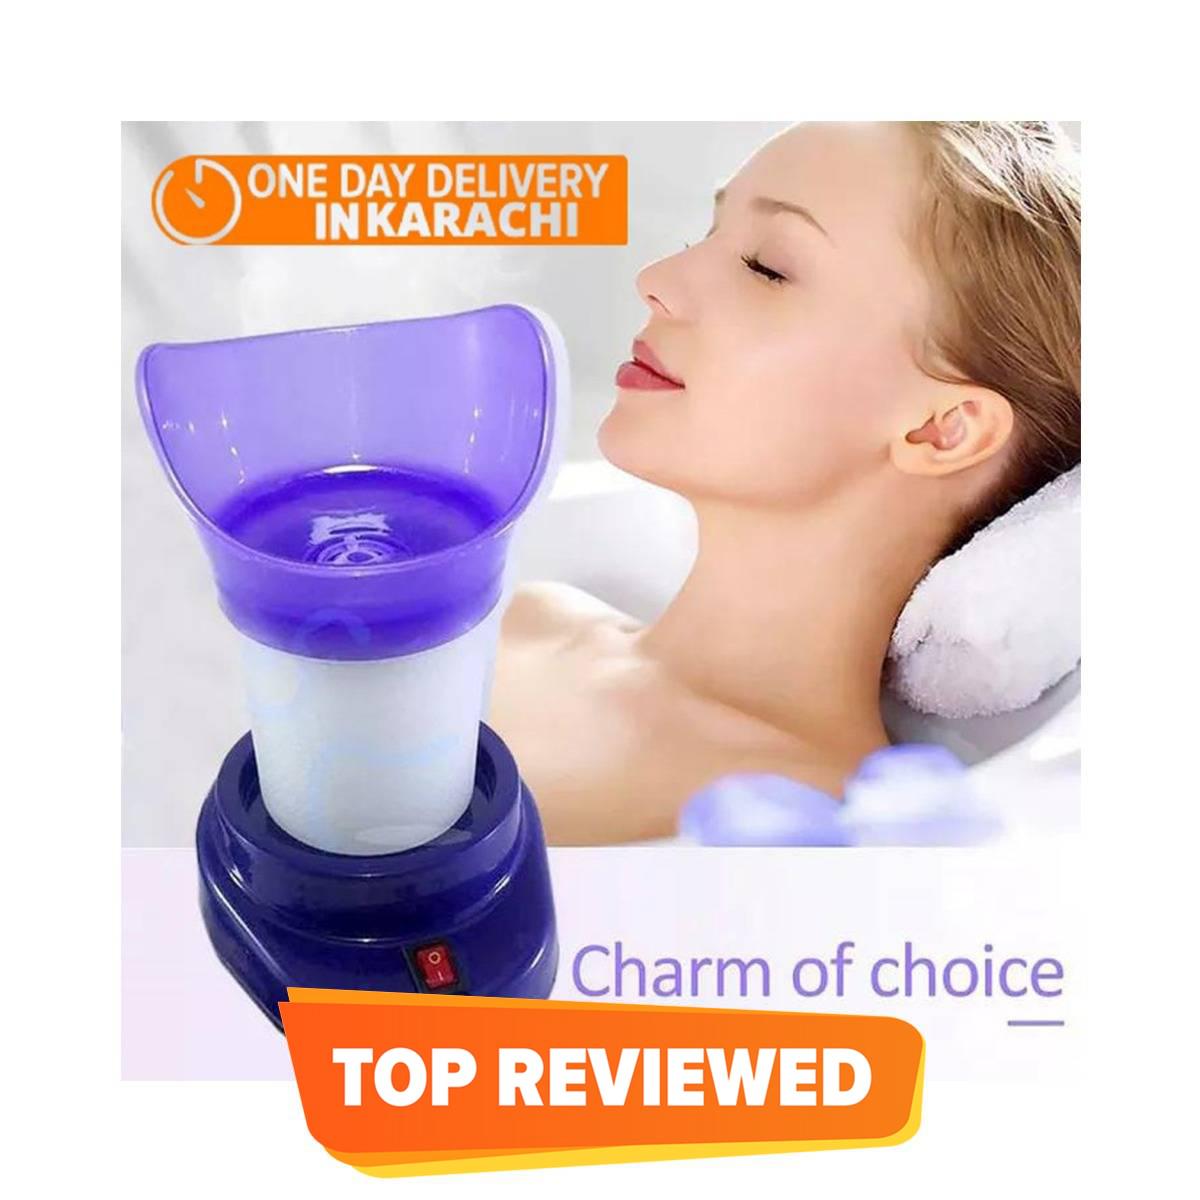 Shinon Original – Steamer and Inhaler for Block Nose & Facial Usage 2 in 1 Massage Tool The Steam Facial